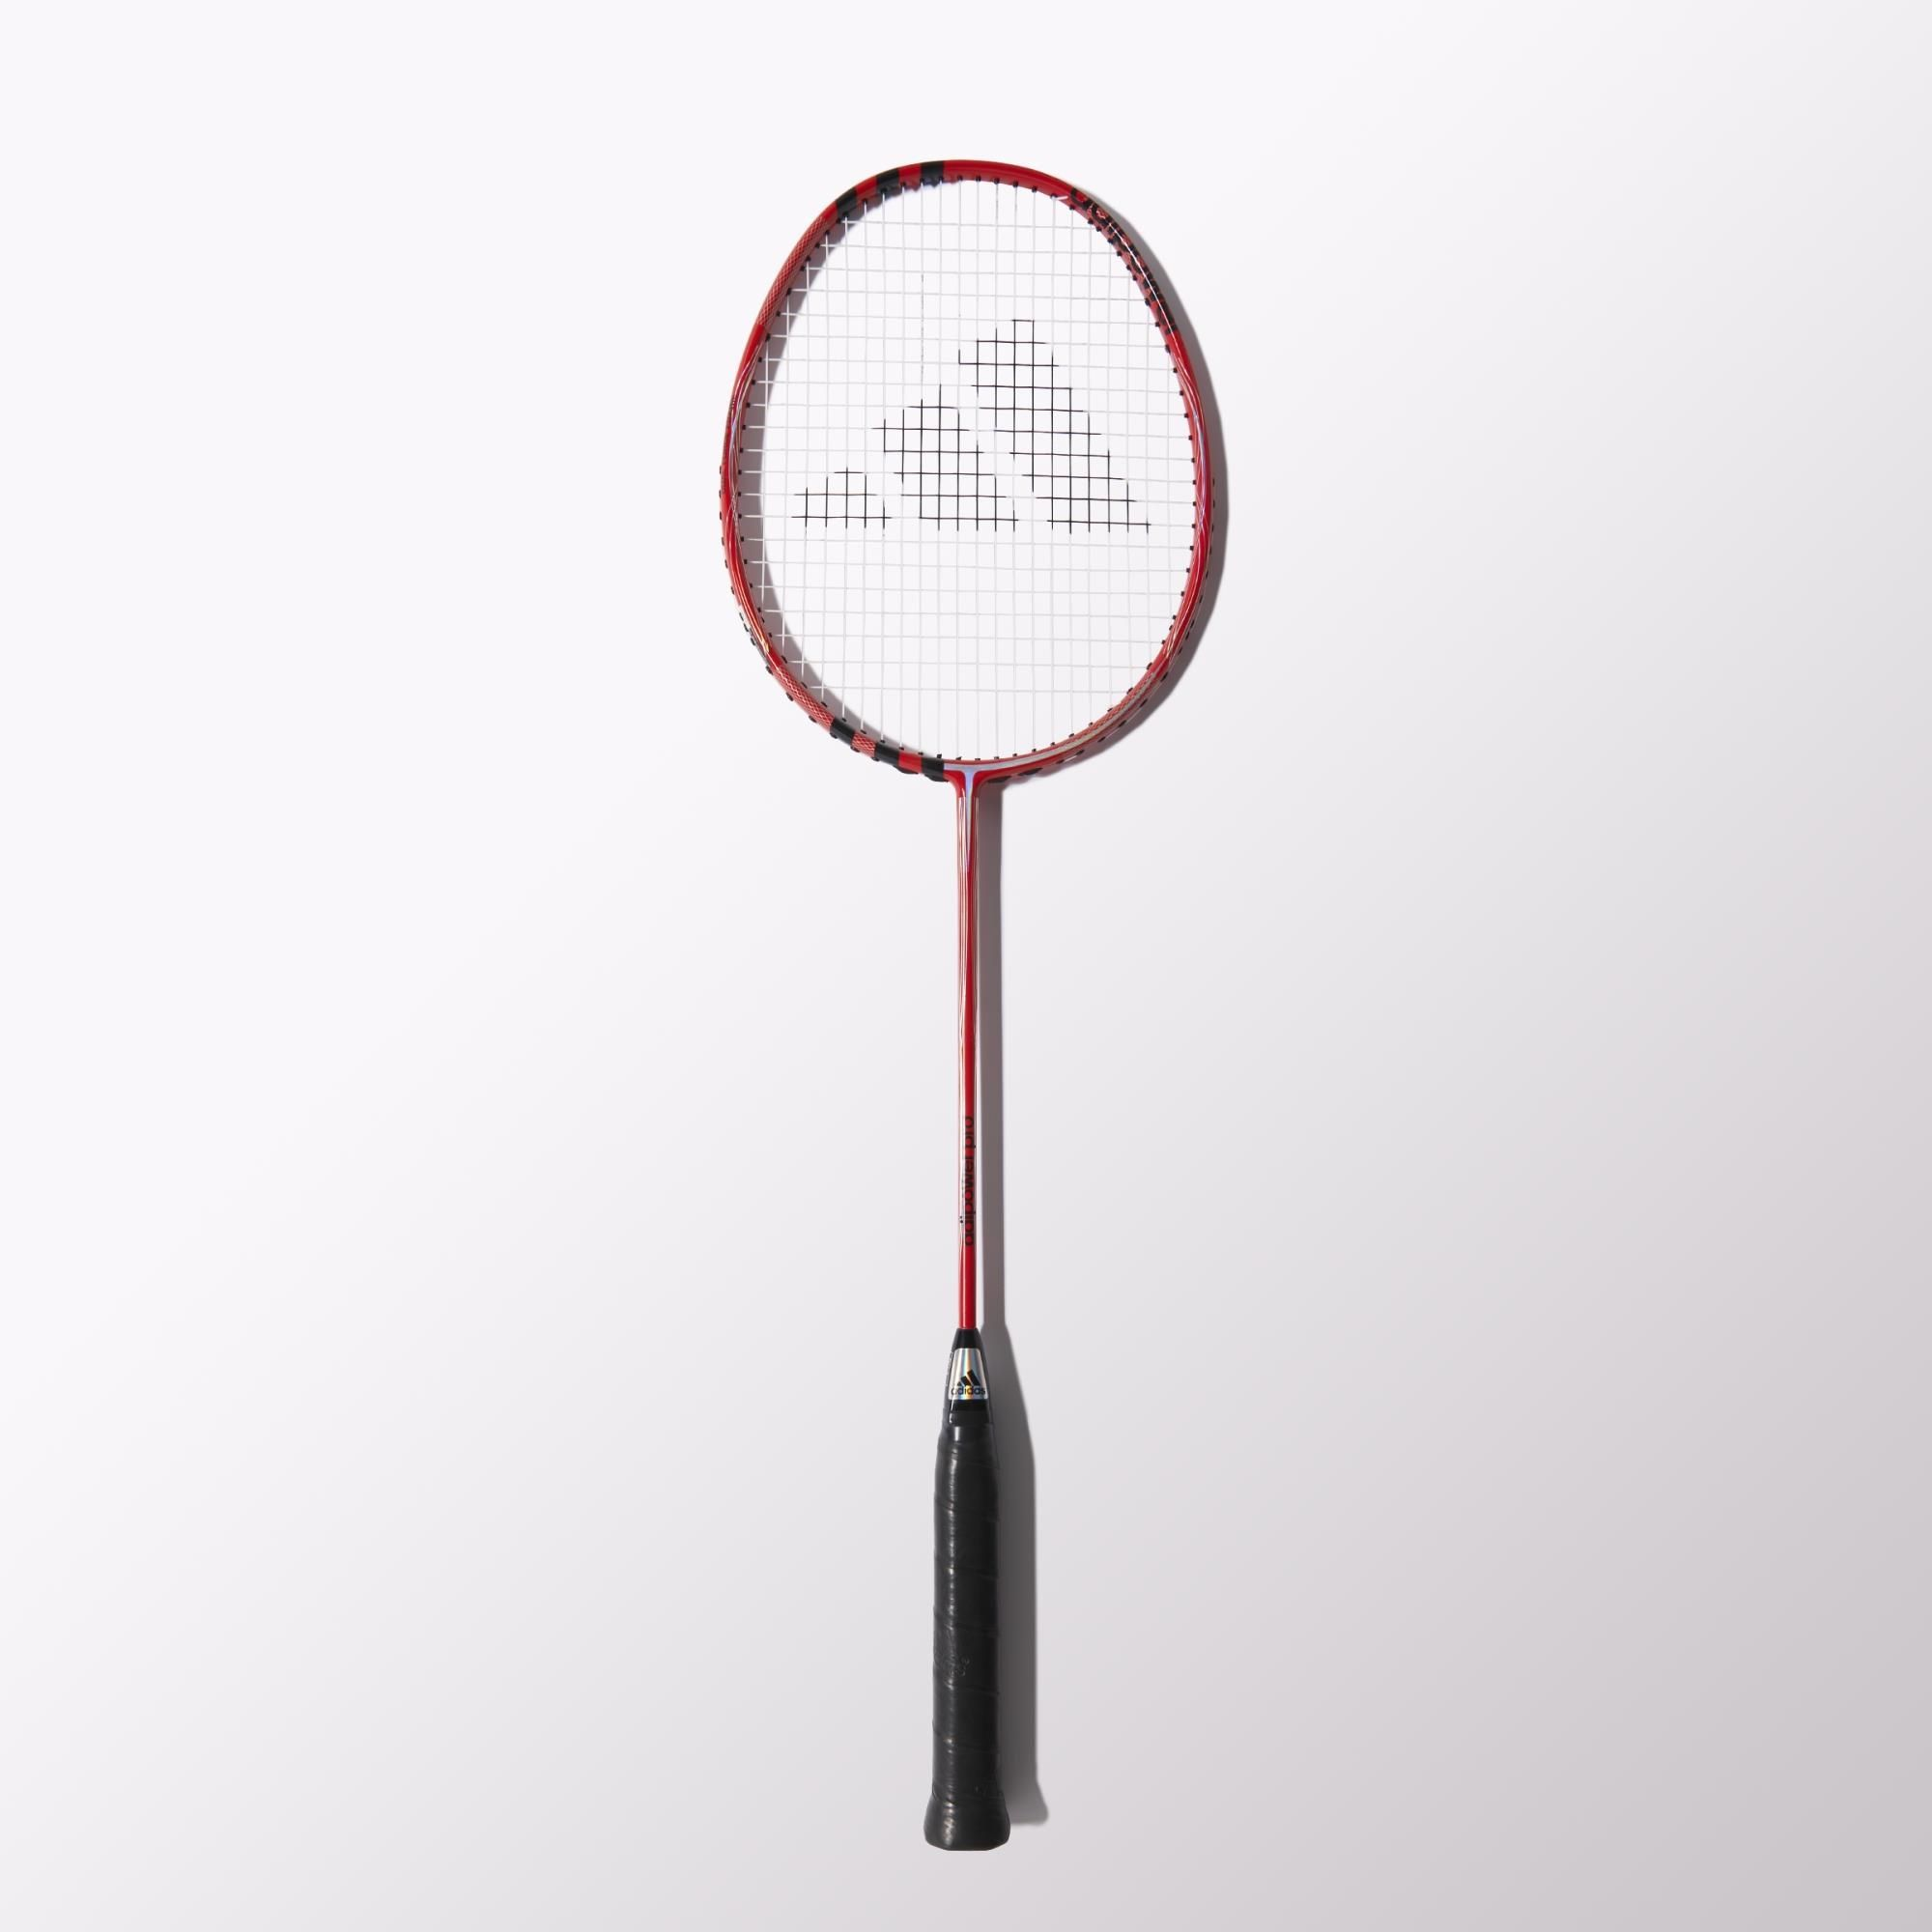 adipower pro Racket | adidas Badminton | Adidas official